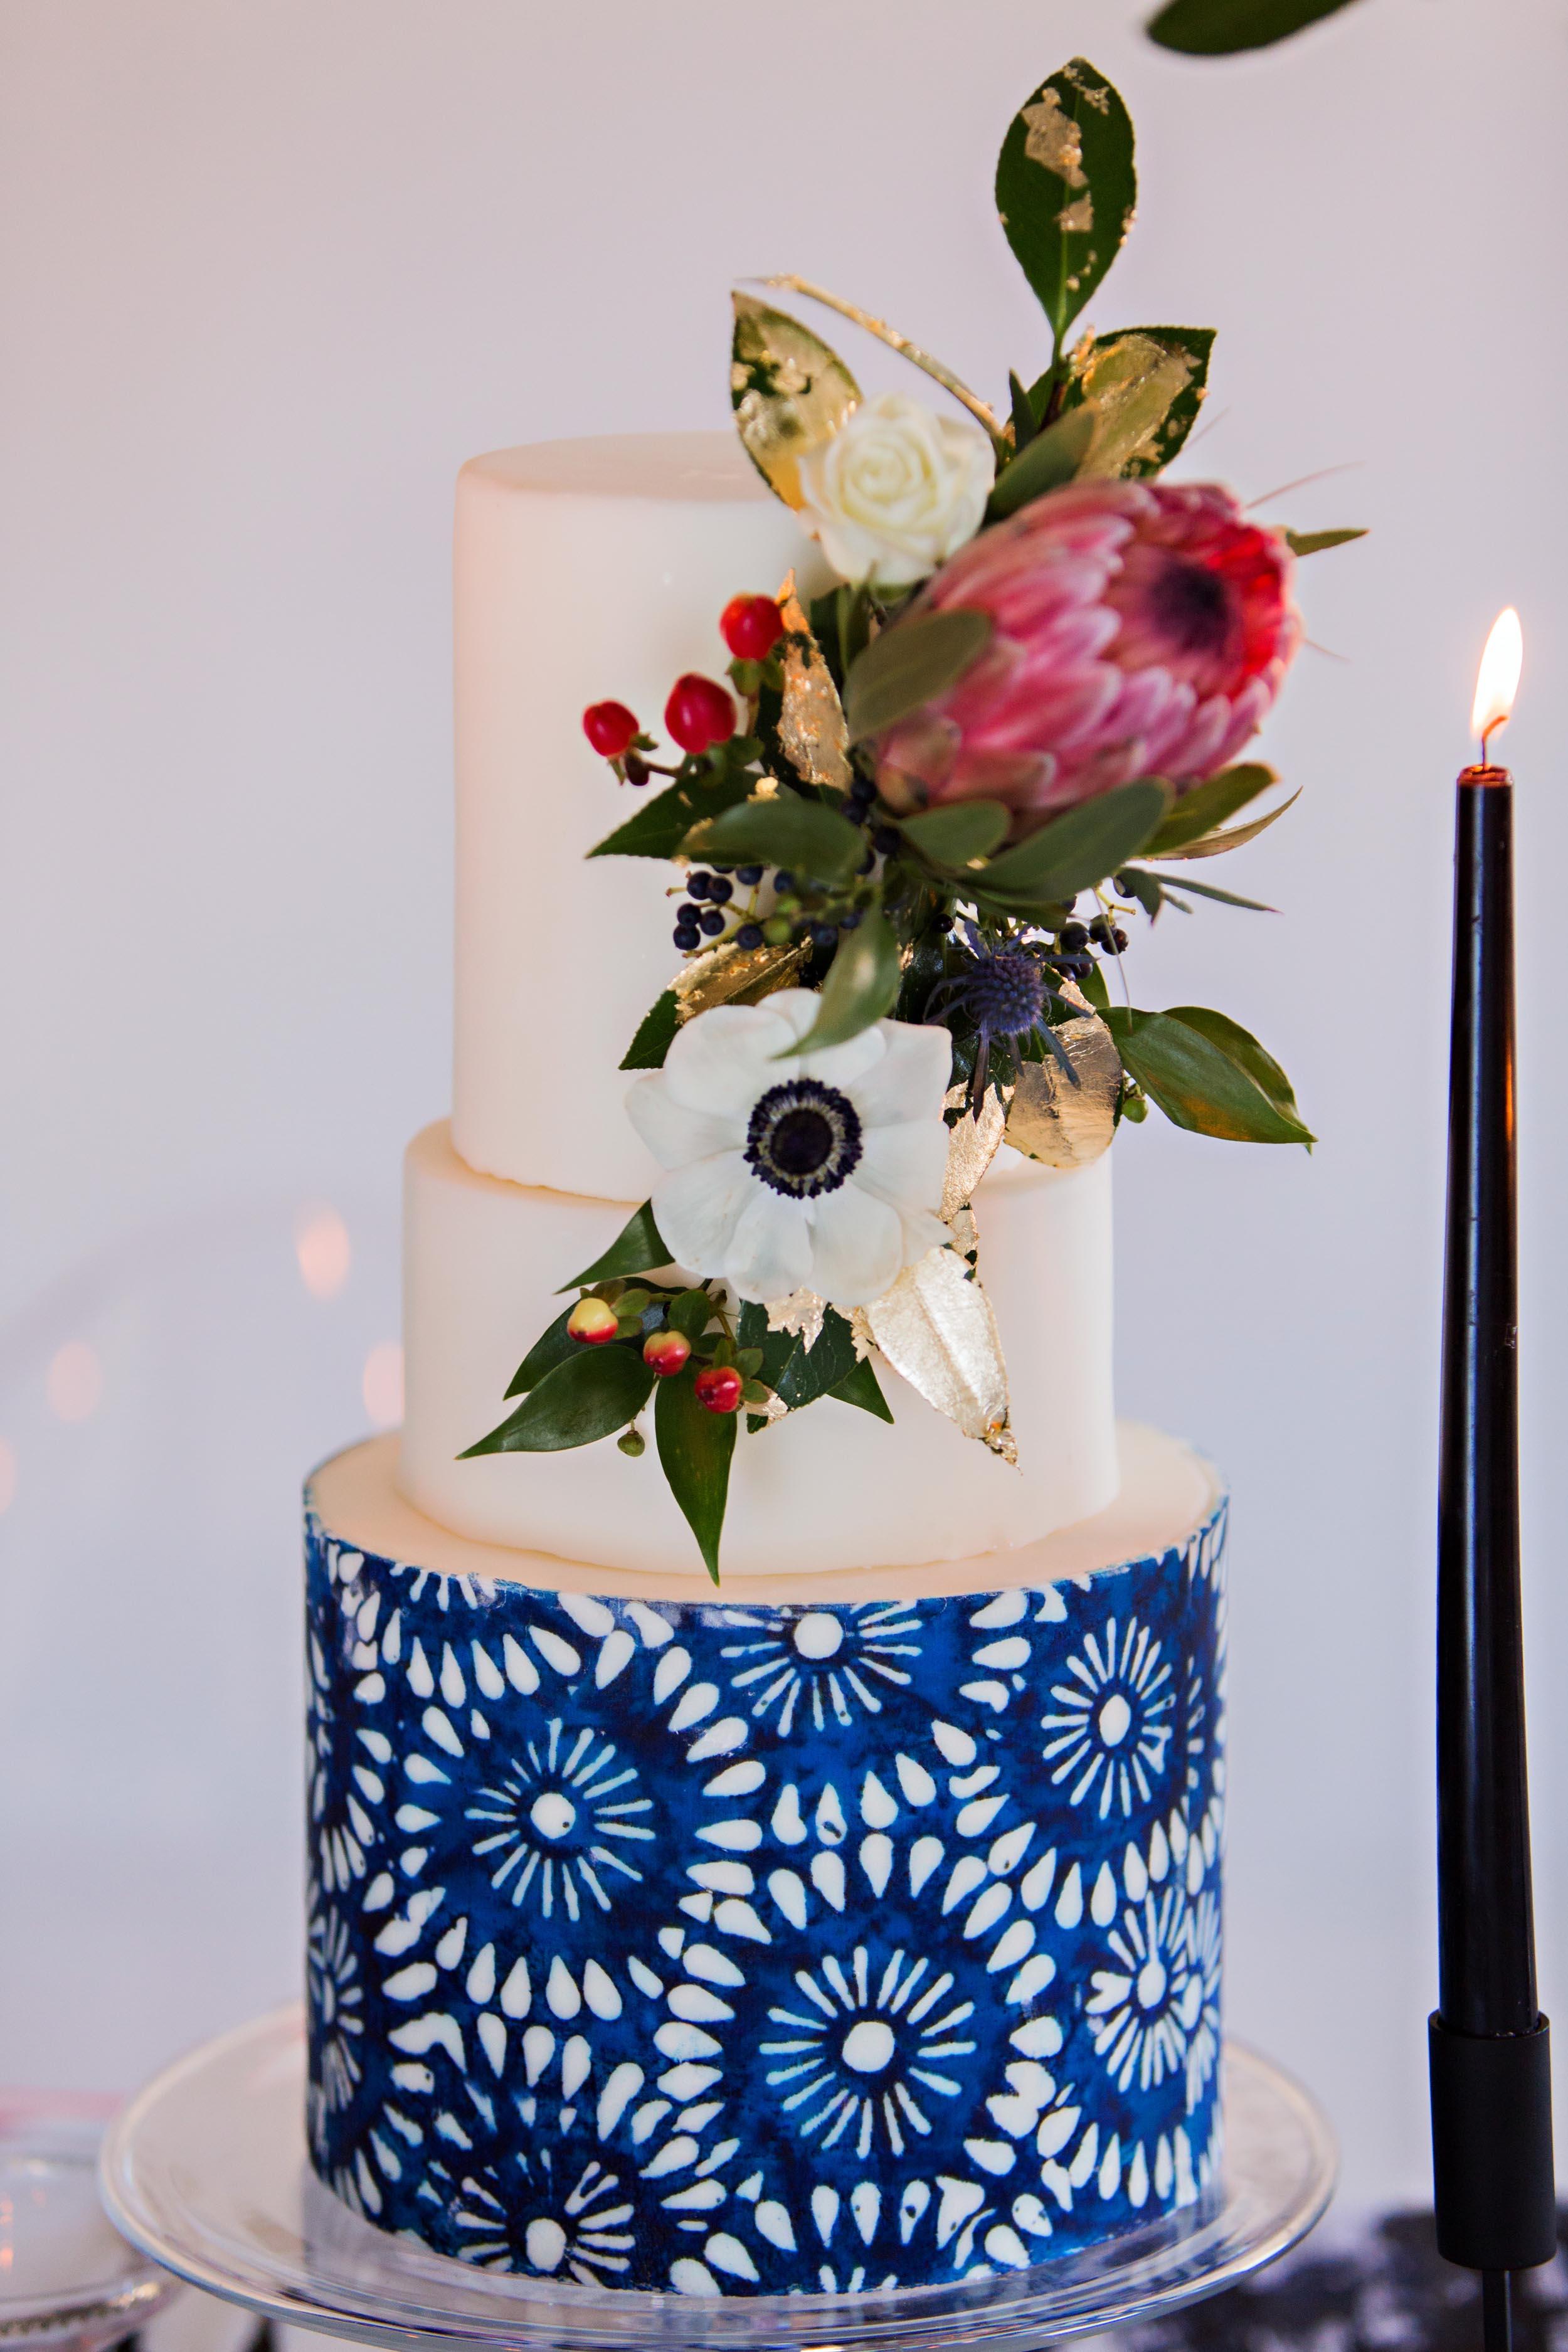 weddings-starsstripes-14.jpg